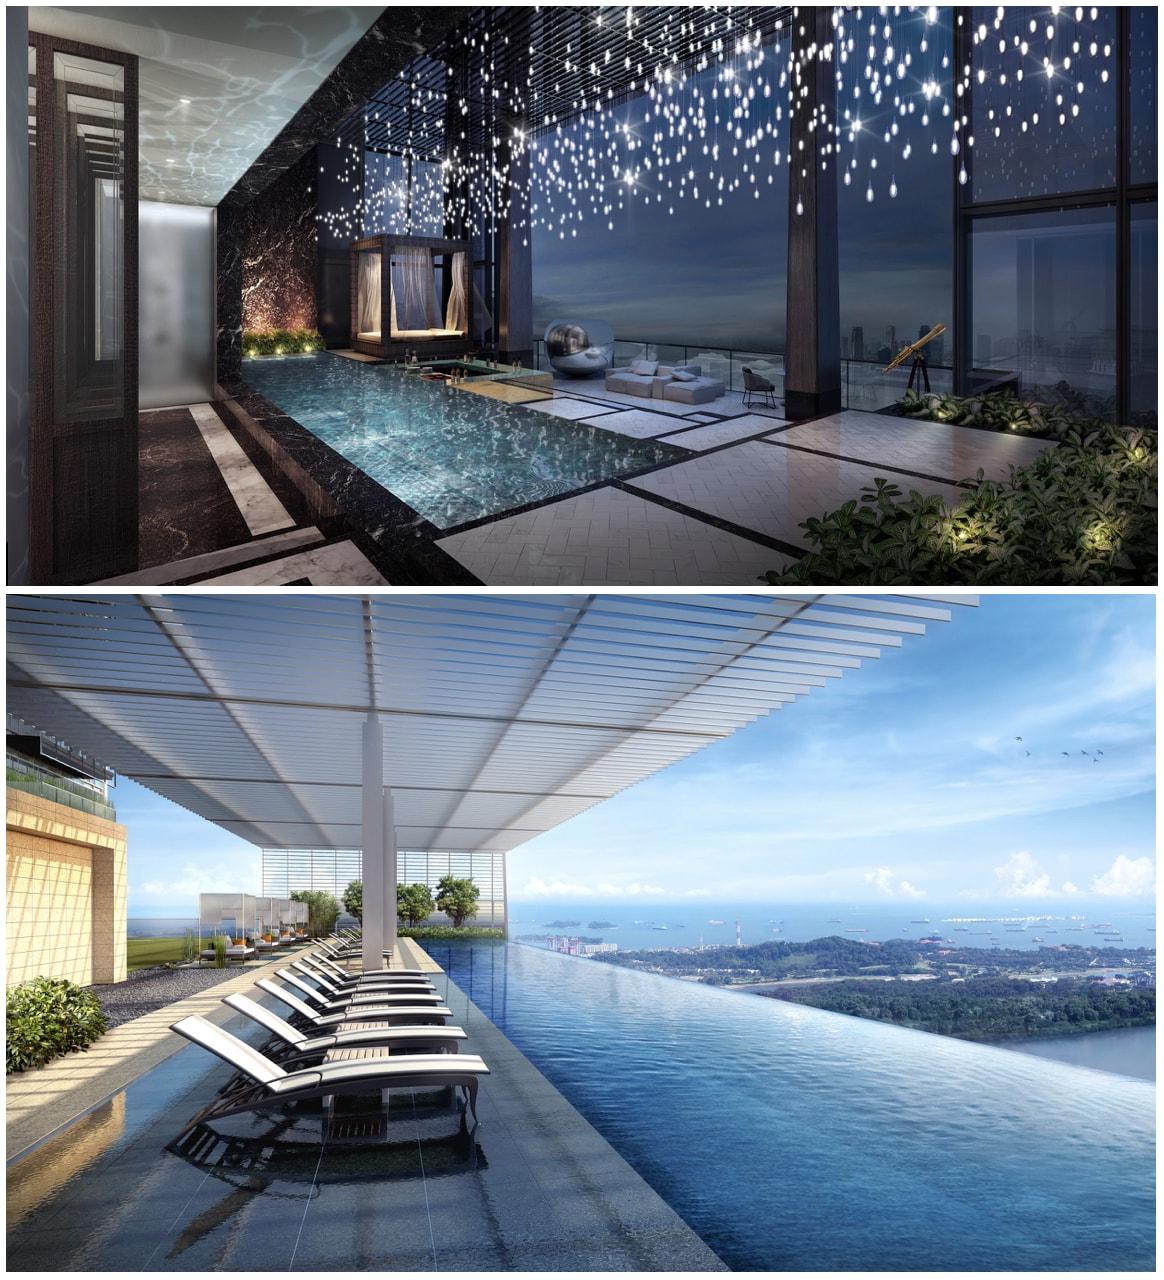 walliach residences penthouses